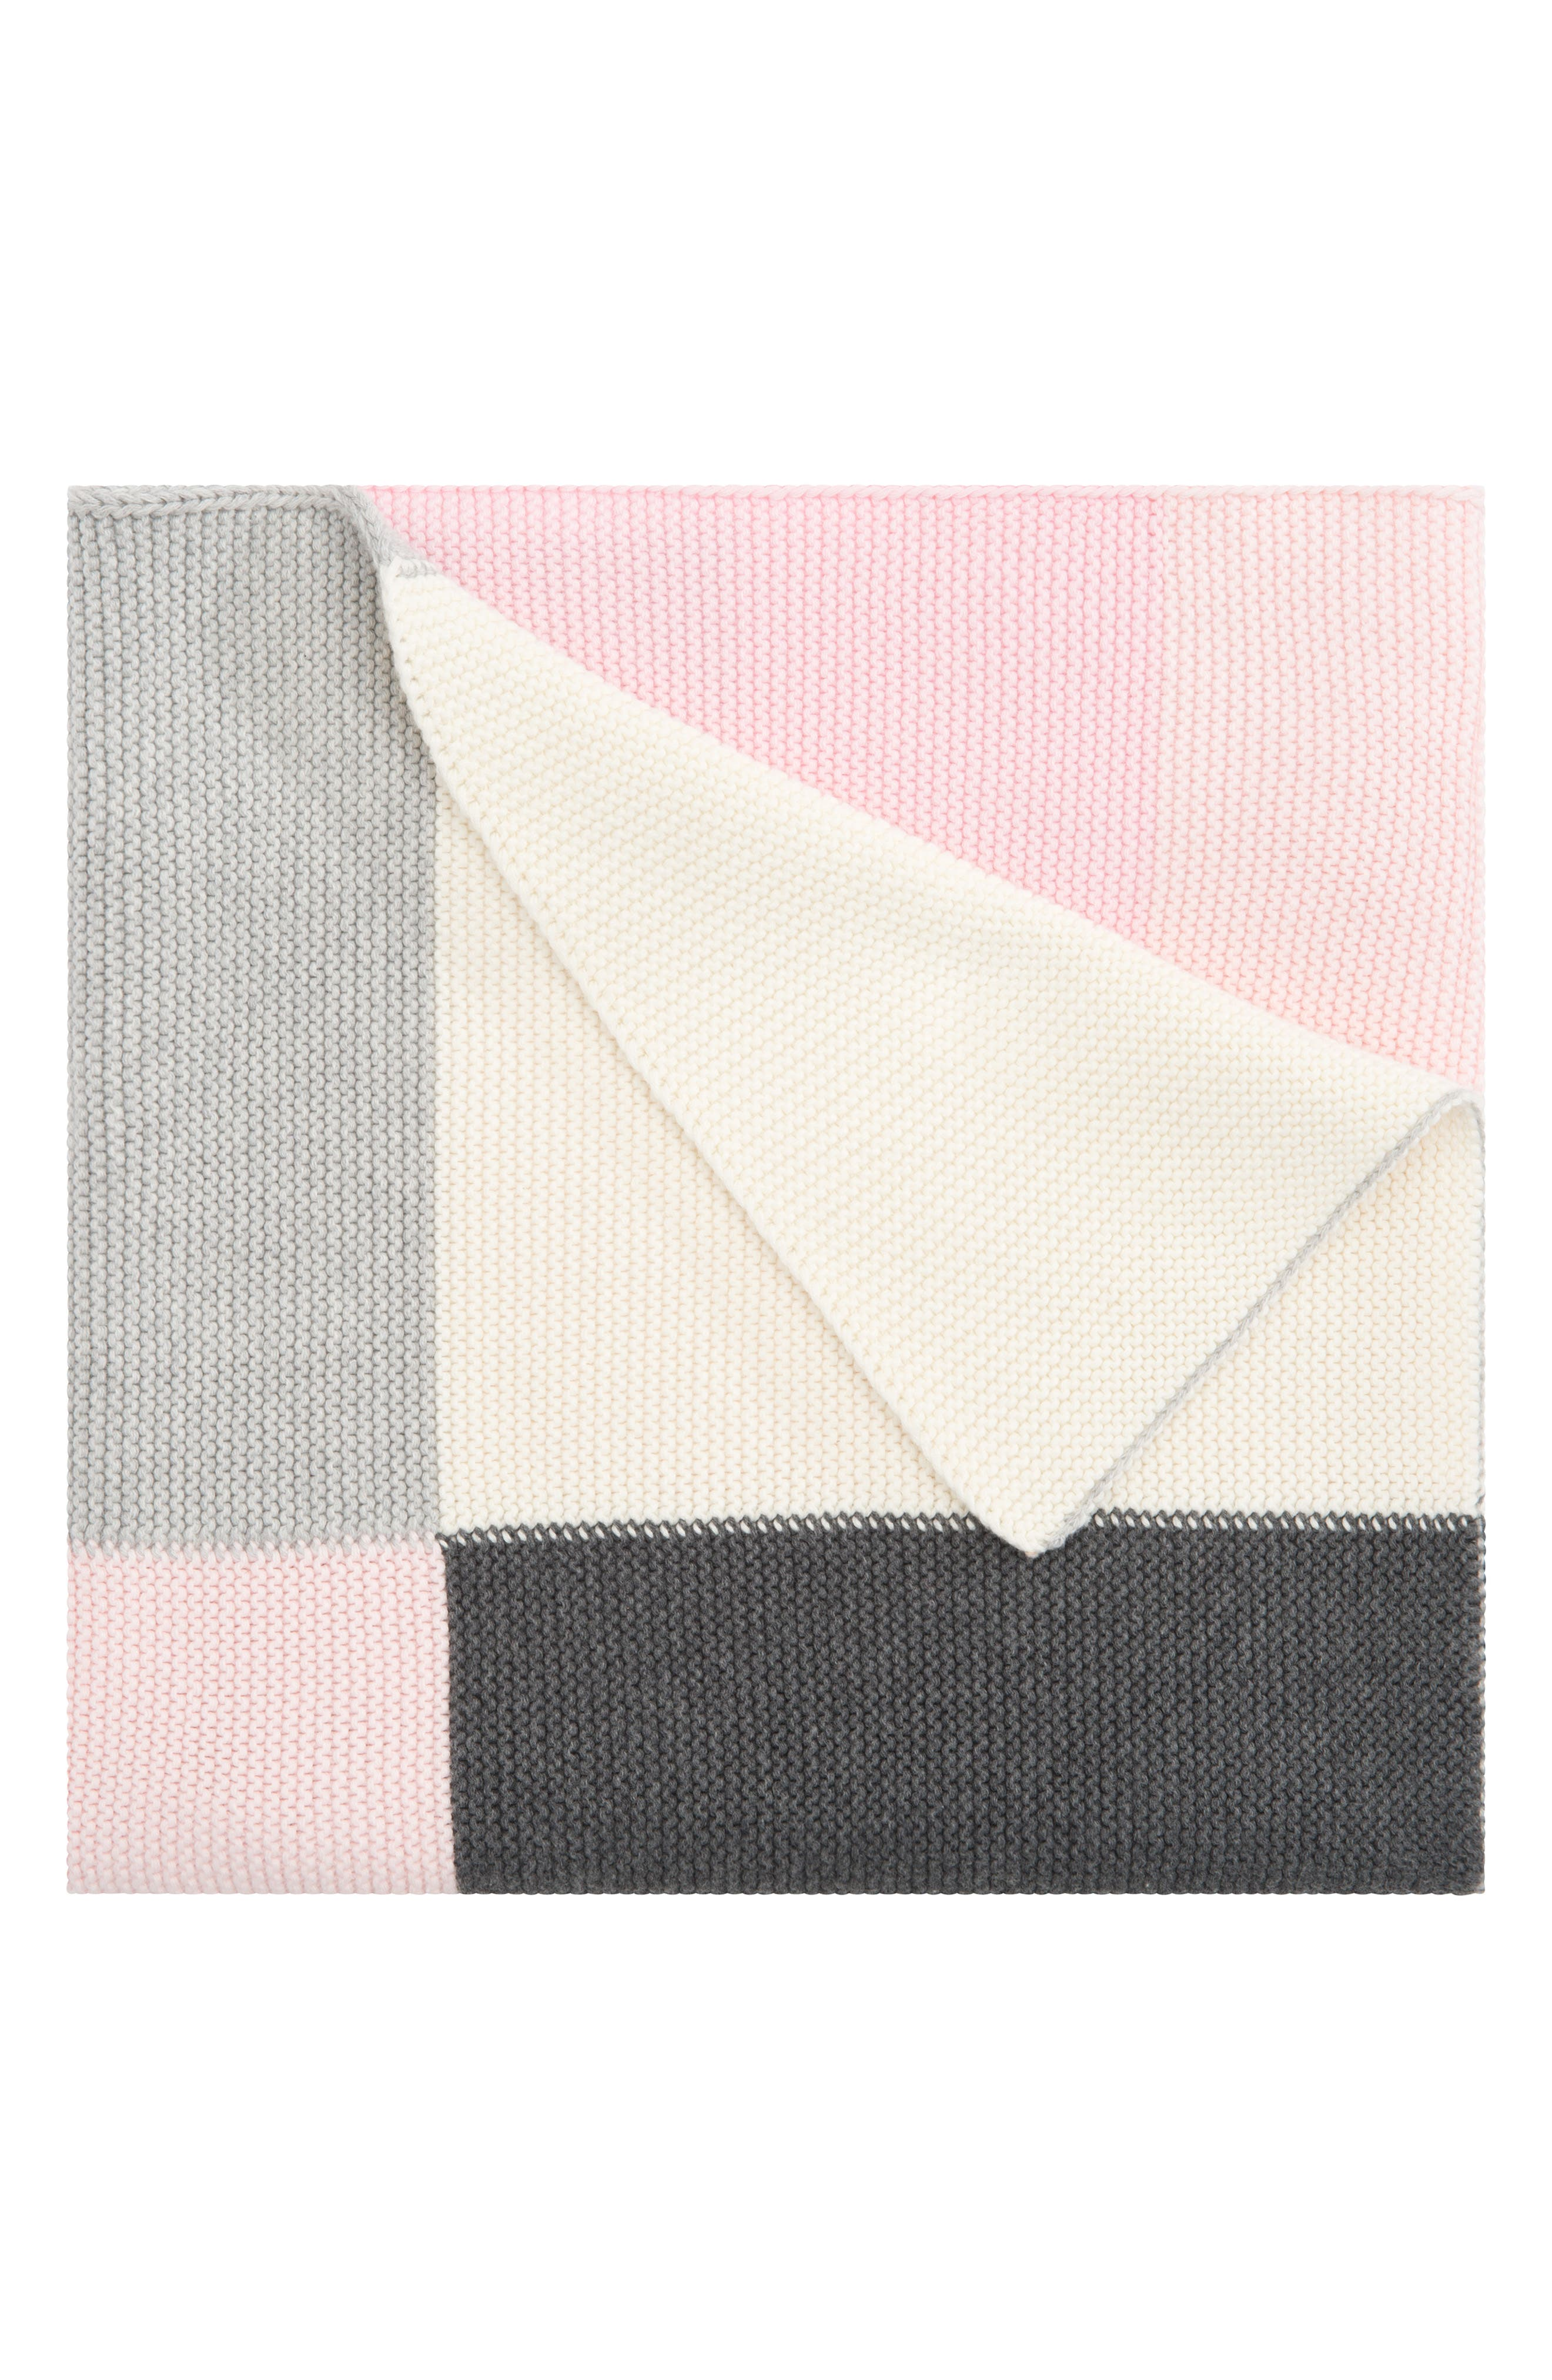 Elegant Baby 'Patchwork' Knit Blanket